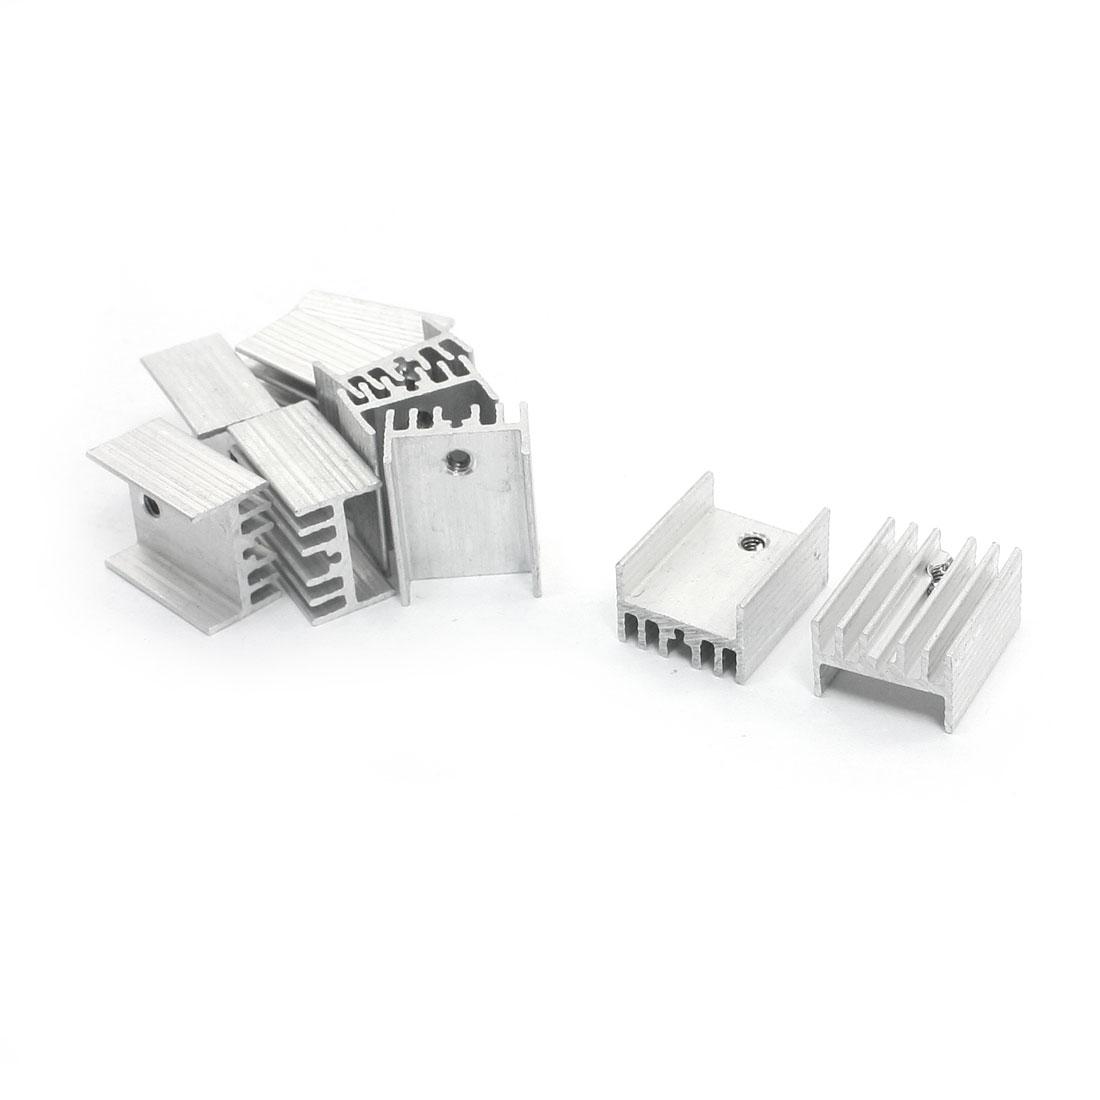 10Pcs 20mm x 15mm x 10mm Aluminium Heatsink Cooler Fin for Transistor